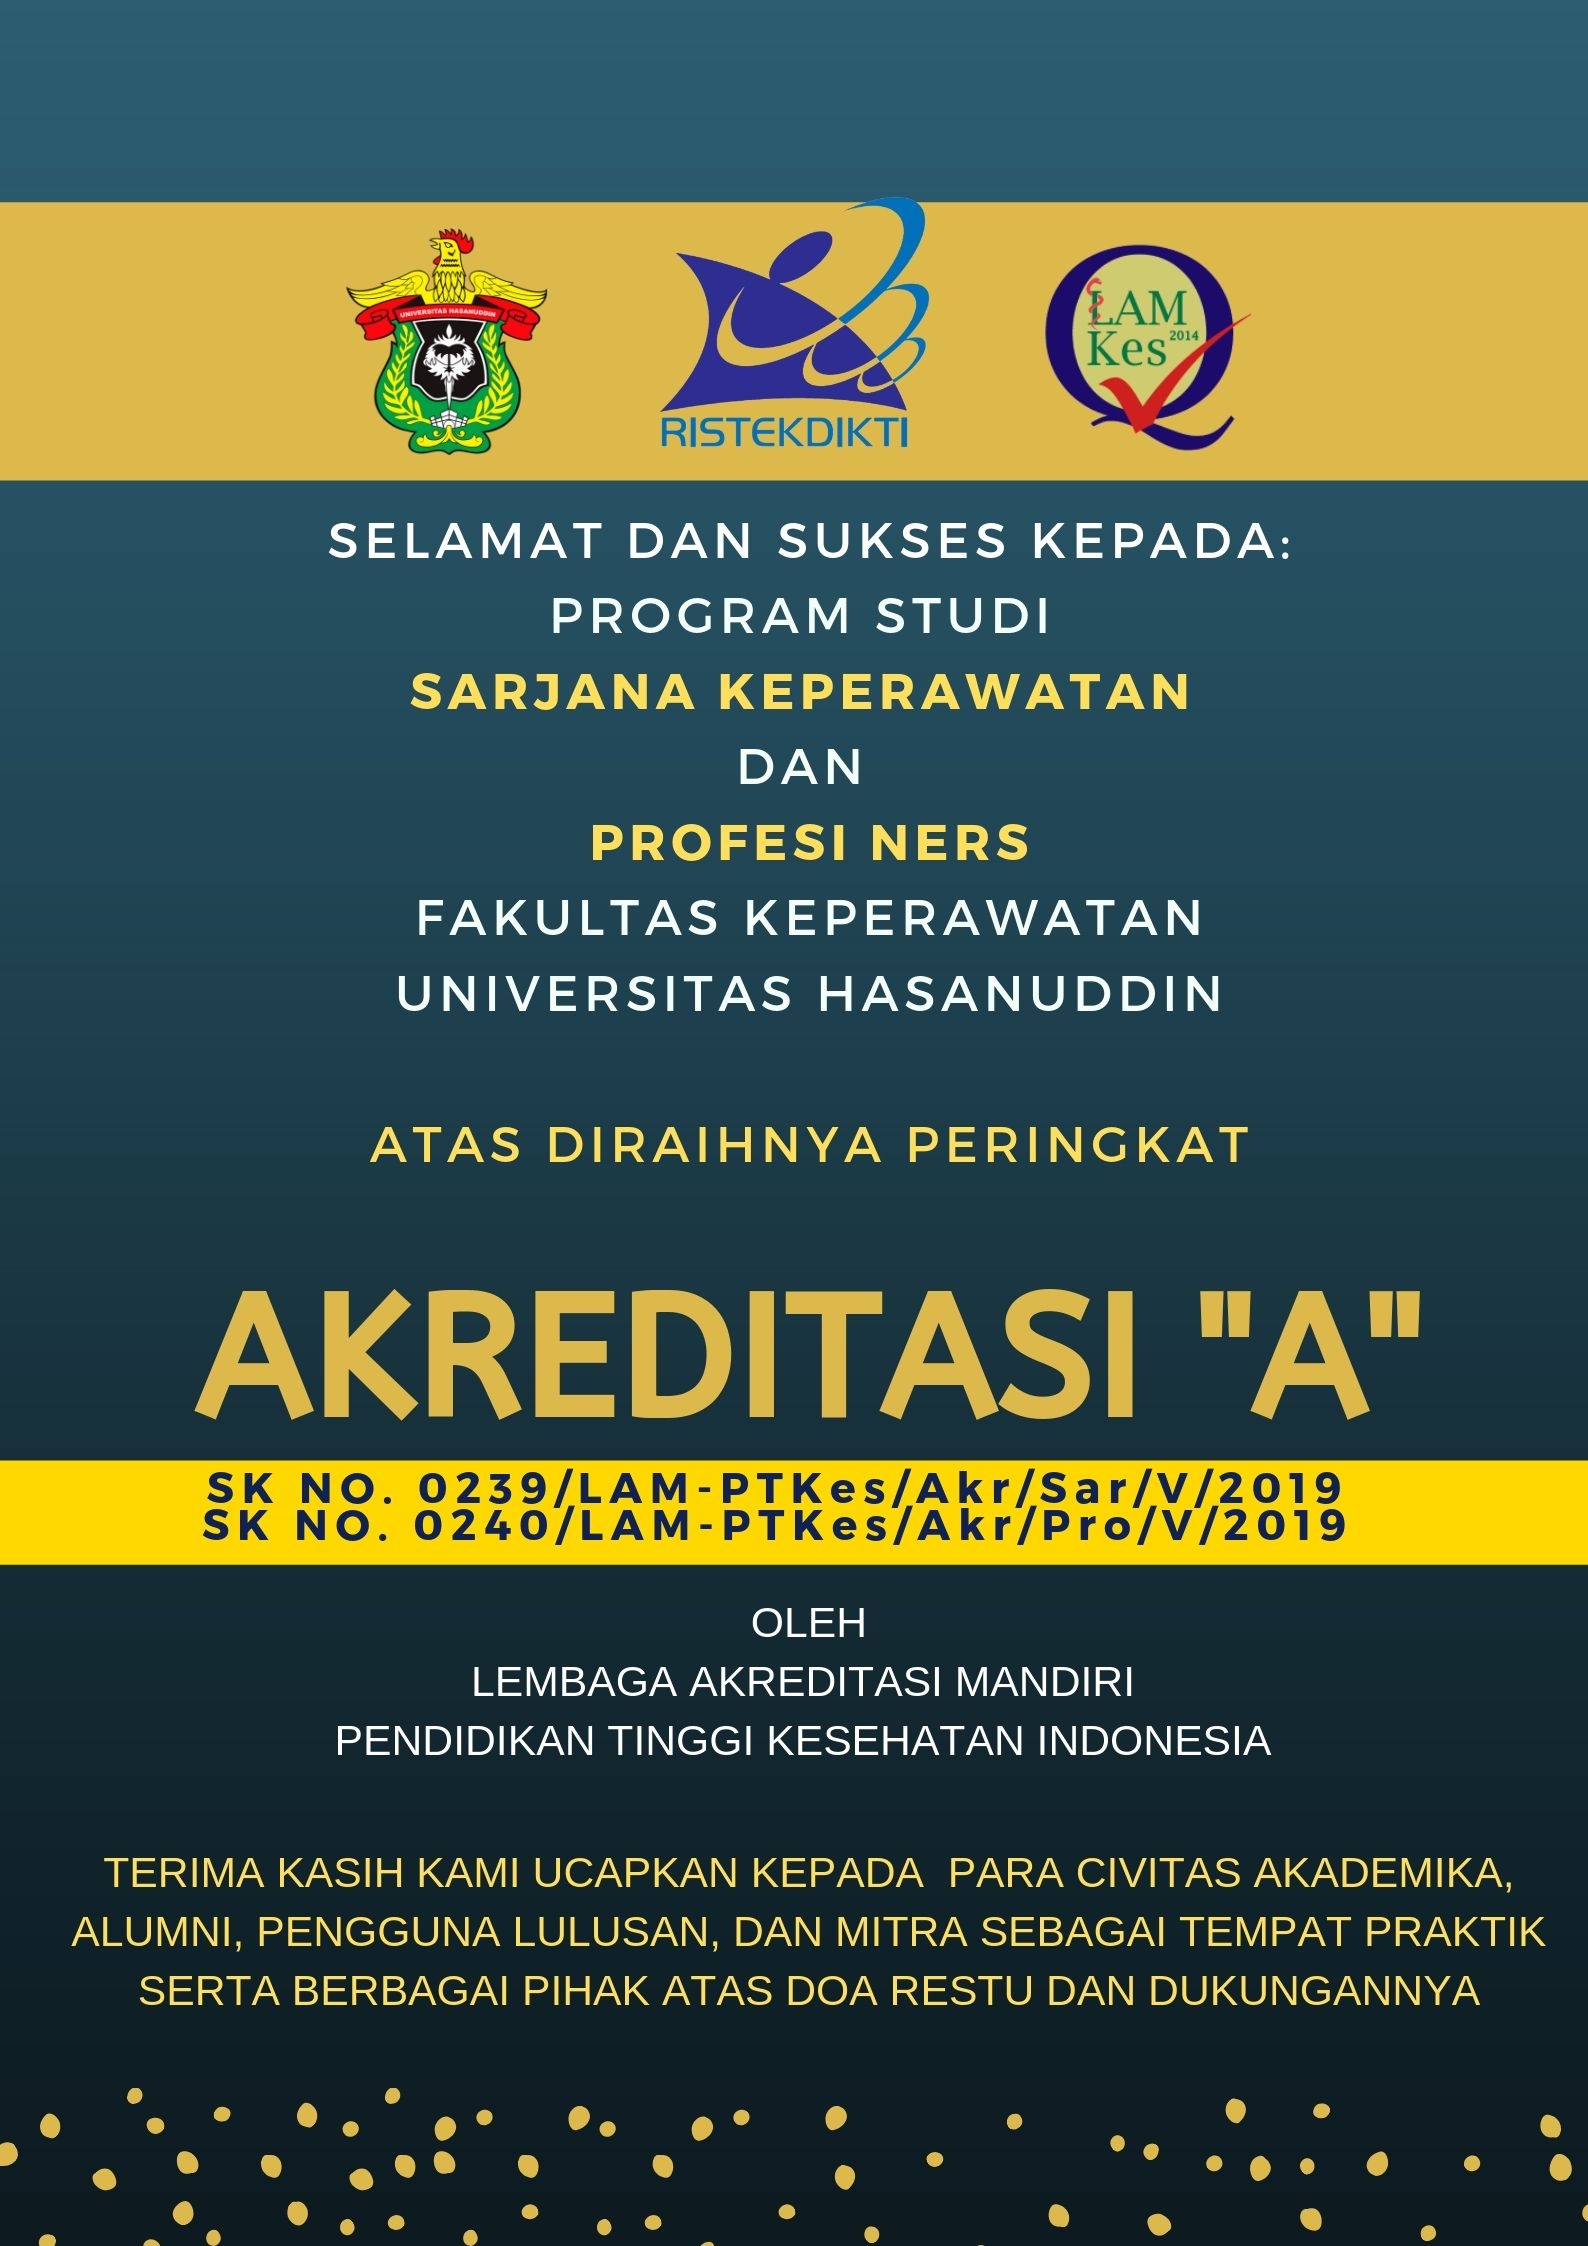 Fakultas Keperawatan Universitas Hasanuddin